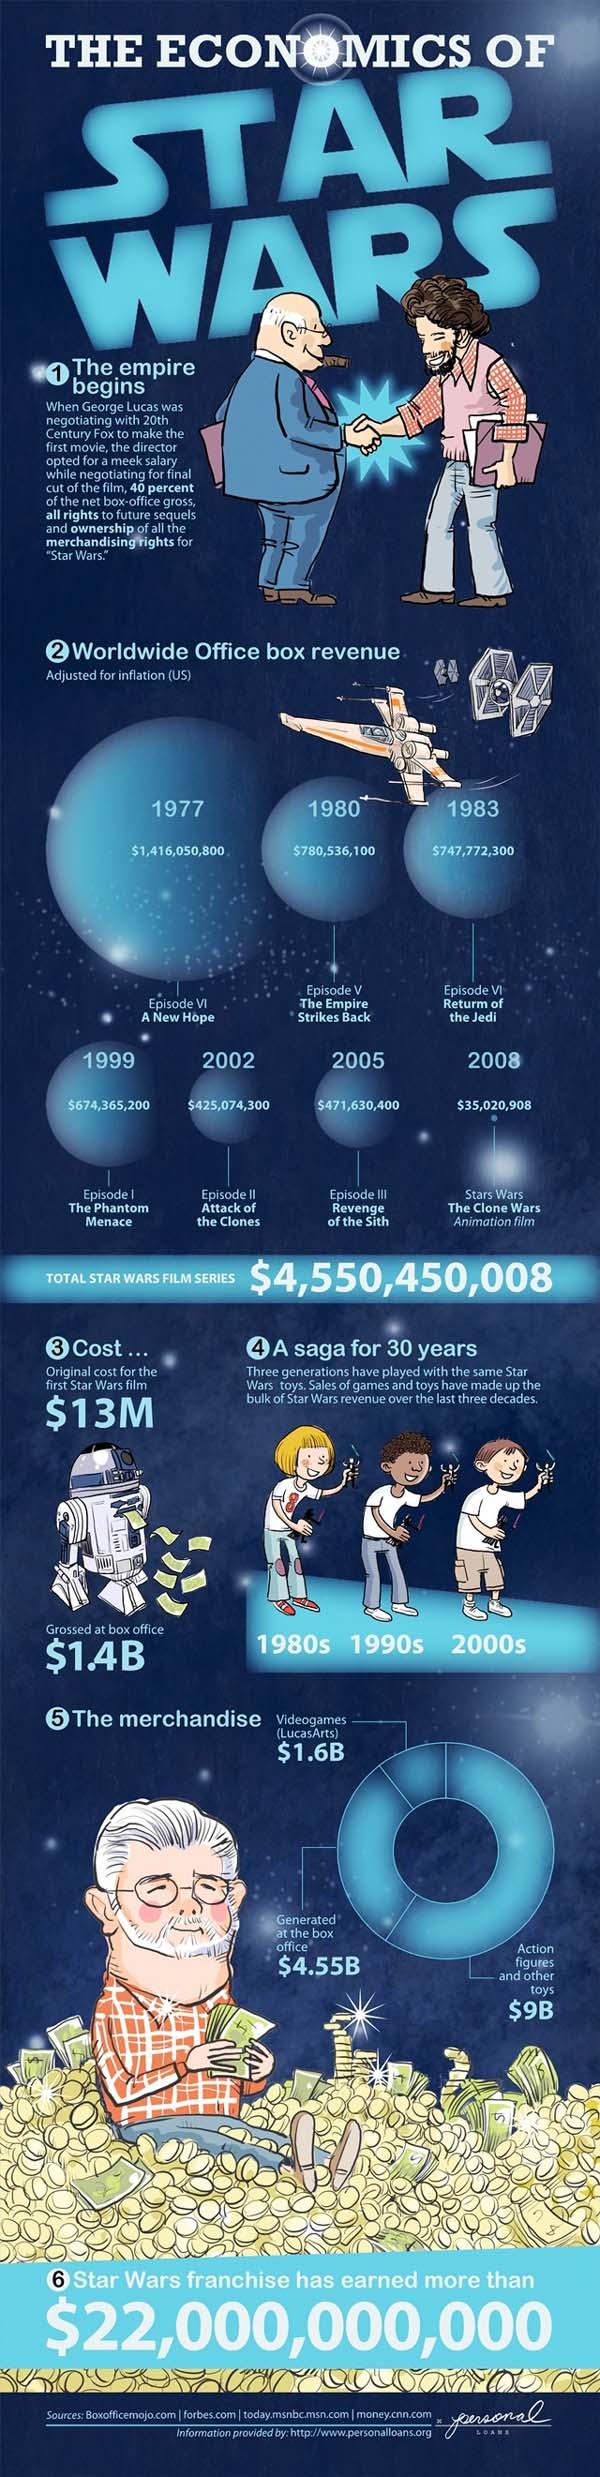 Star Wars Economics Infographic